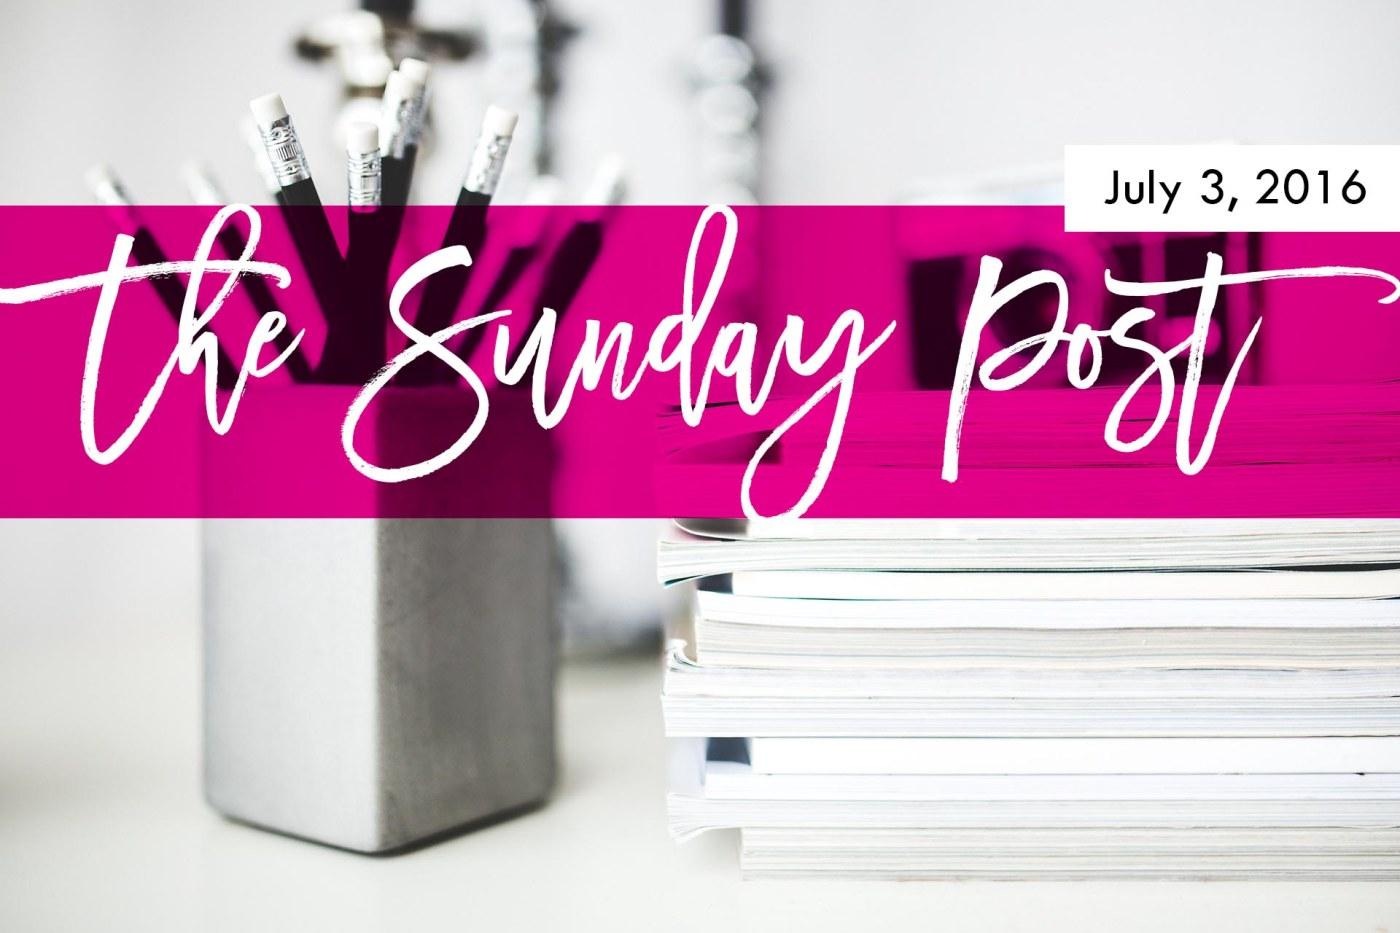 1. Sunday Post 7-3-216